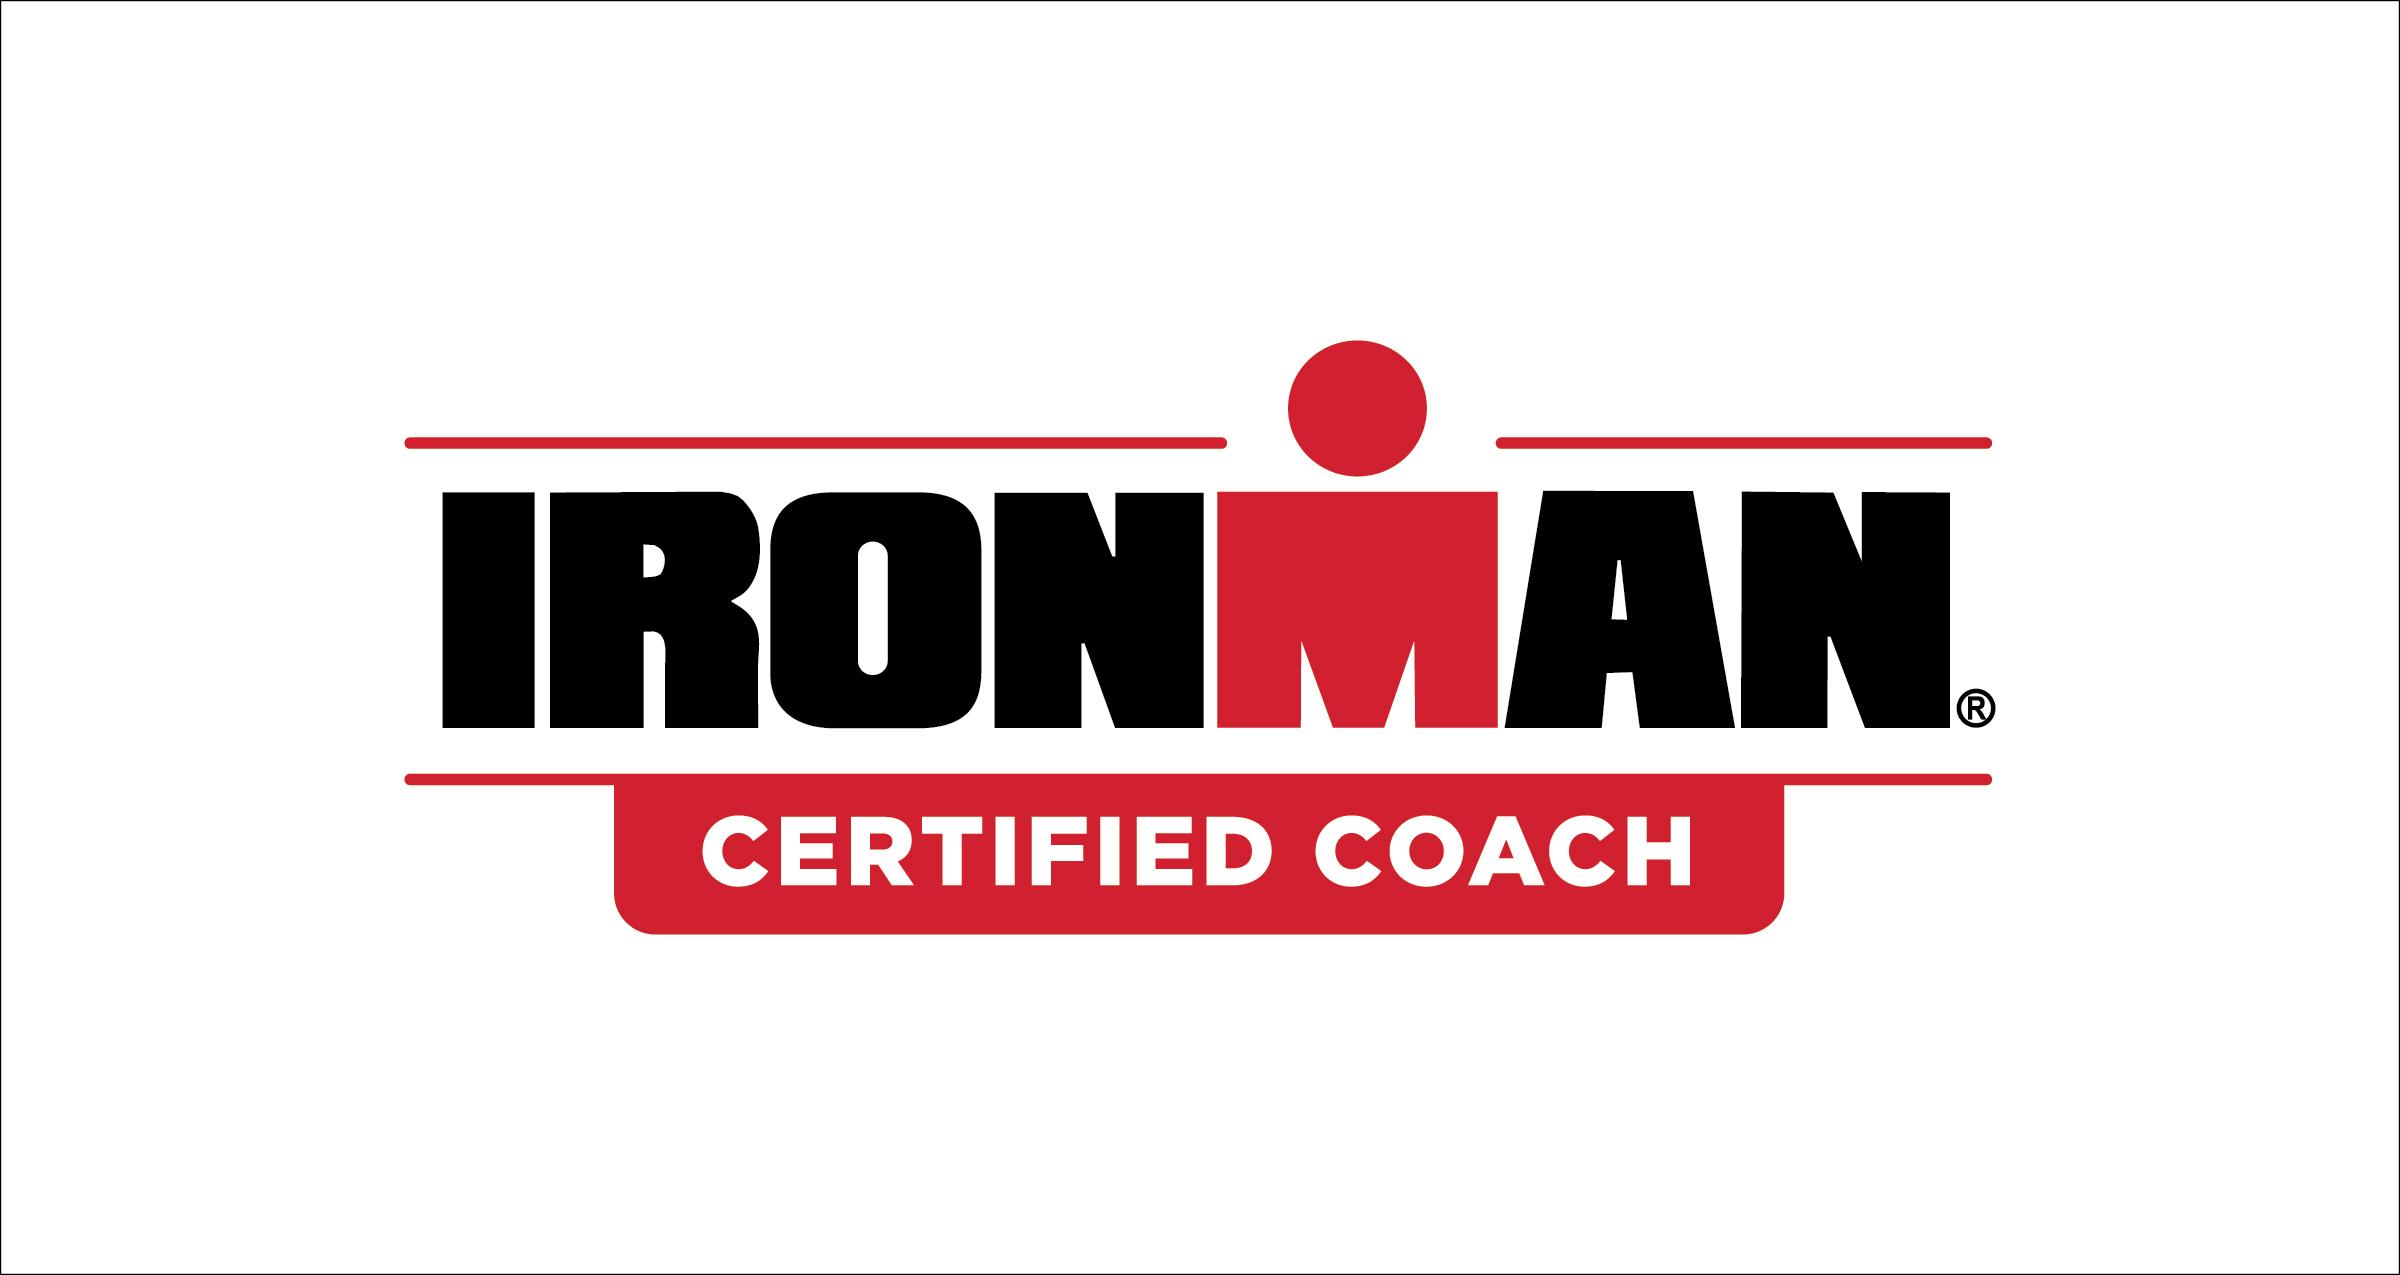 Ironman University Certified Coach